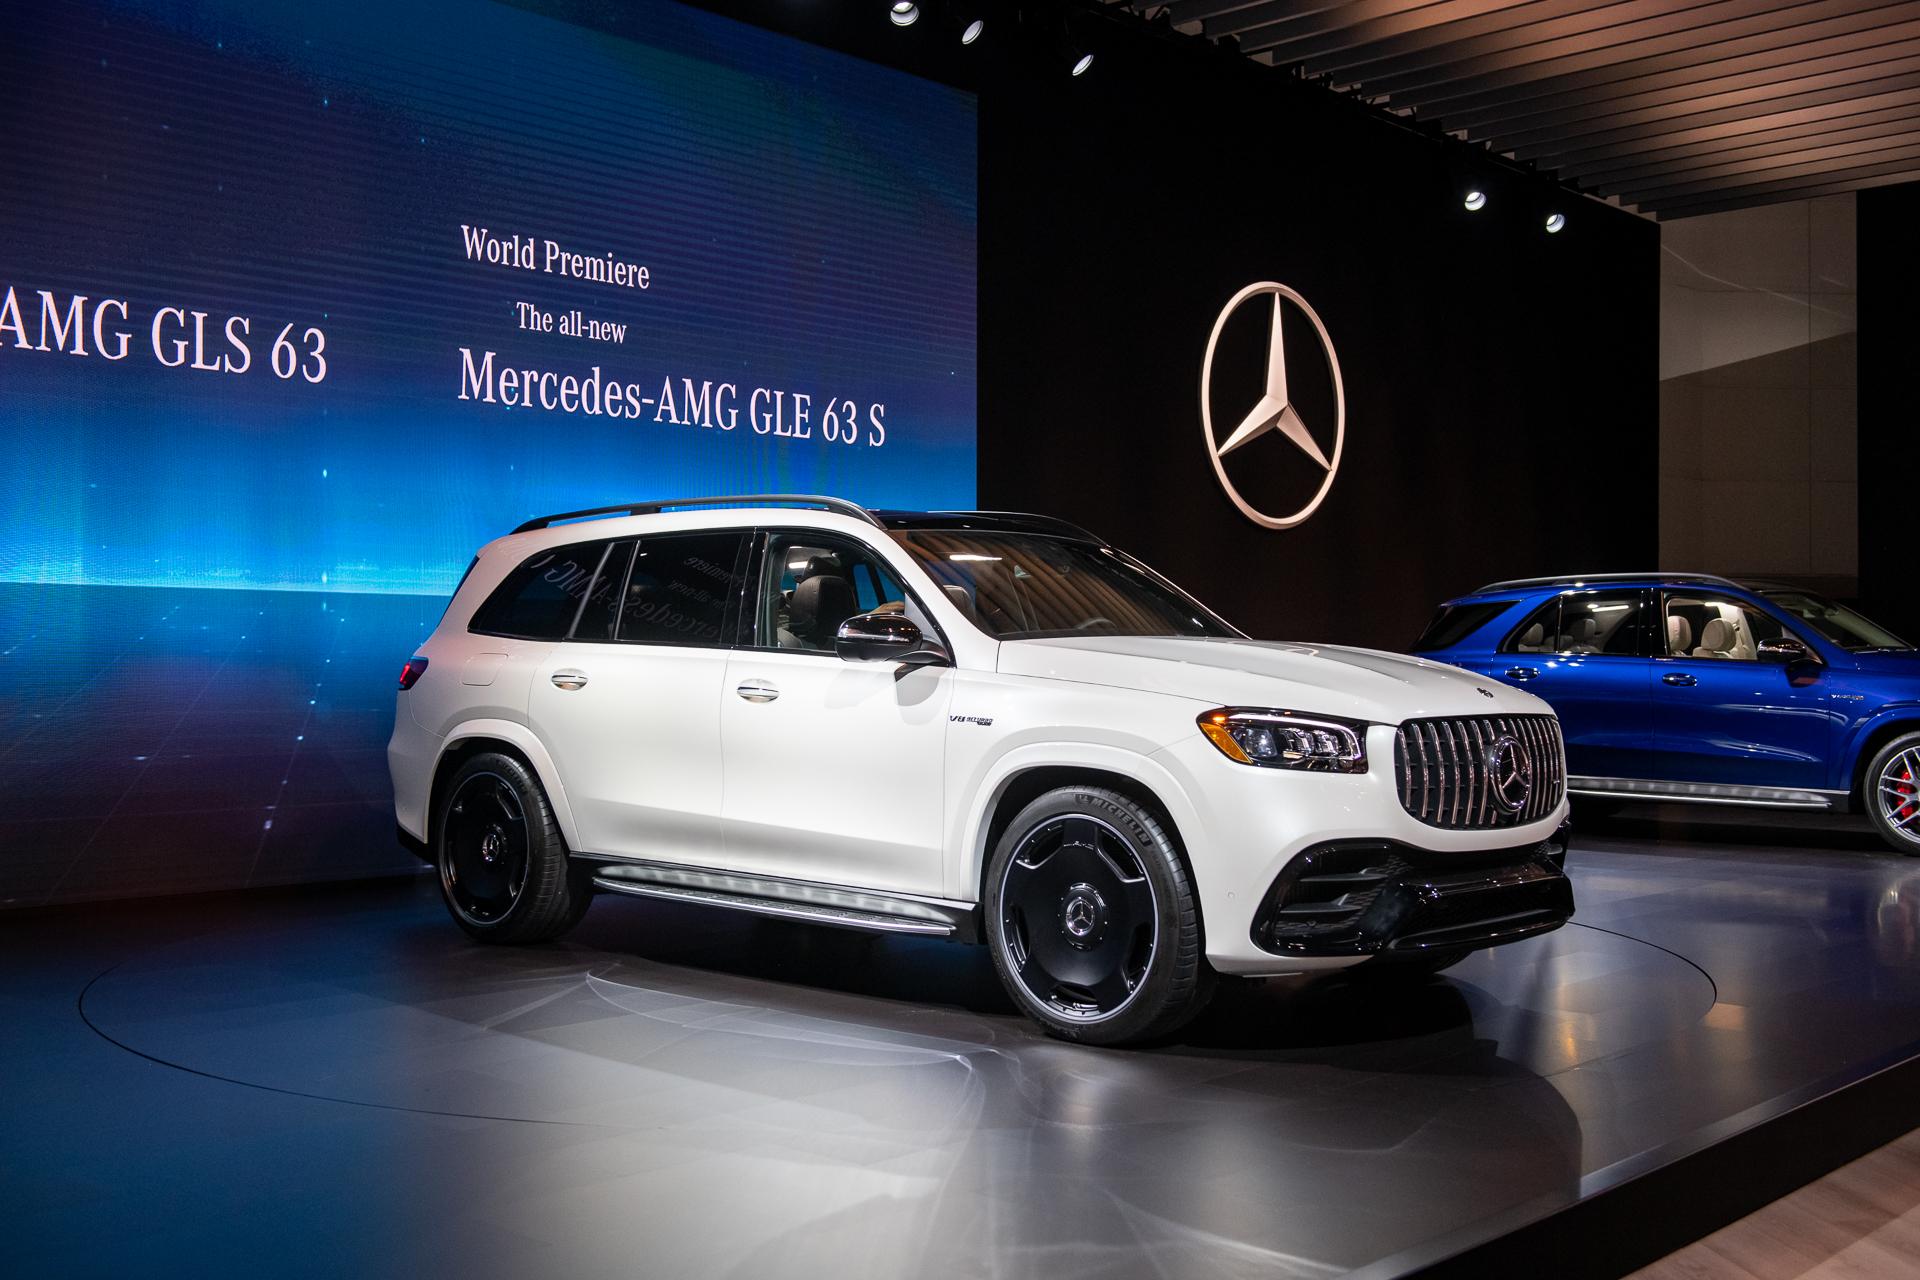 2021 Mercedes Benz Gle 63 Amg Gls 63 Amg Pair Fire Breathing V 8 To Mild Hybrid Powertrains